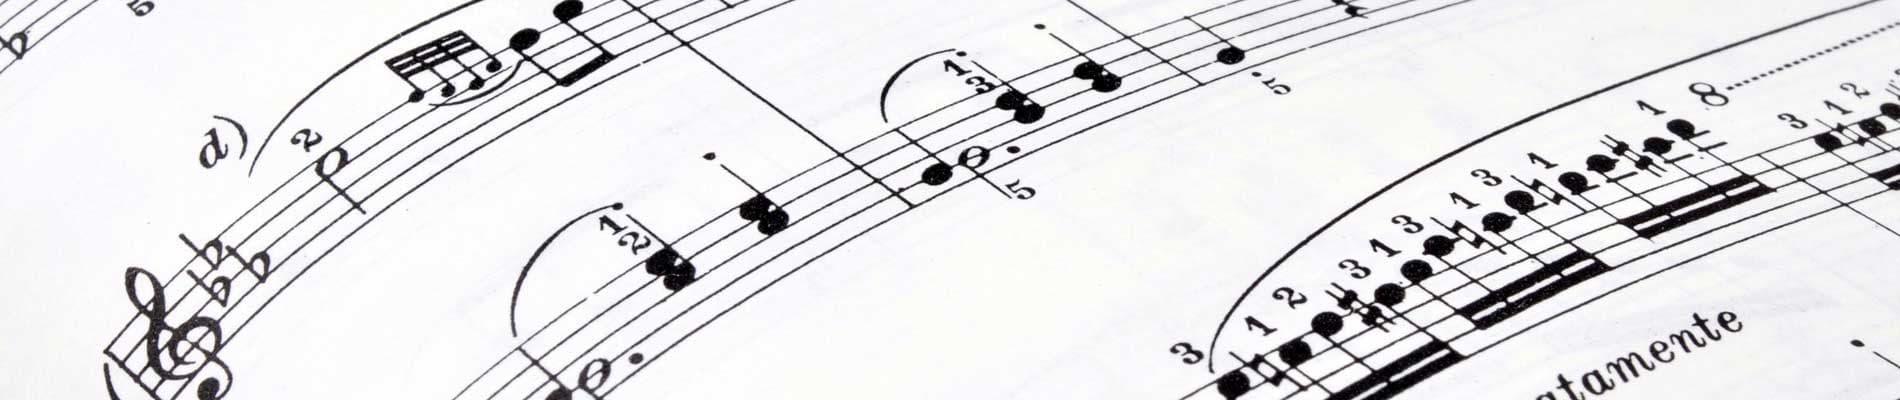 Maestro en educación musical/pedagogía musical